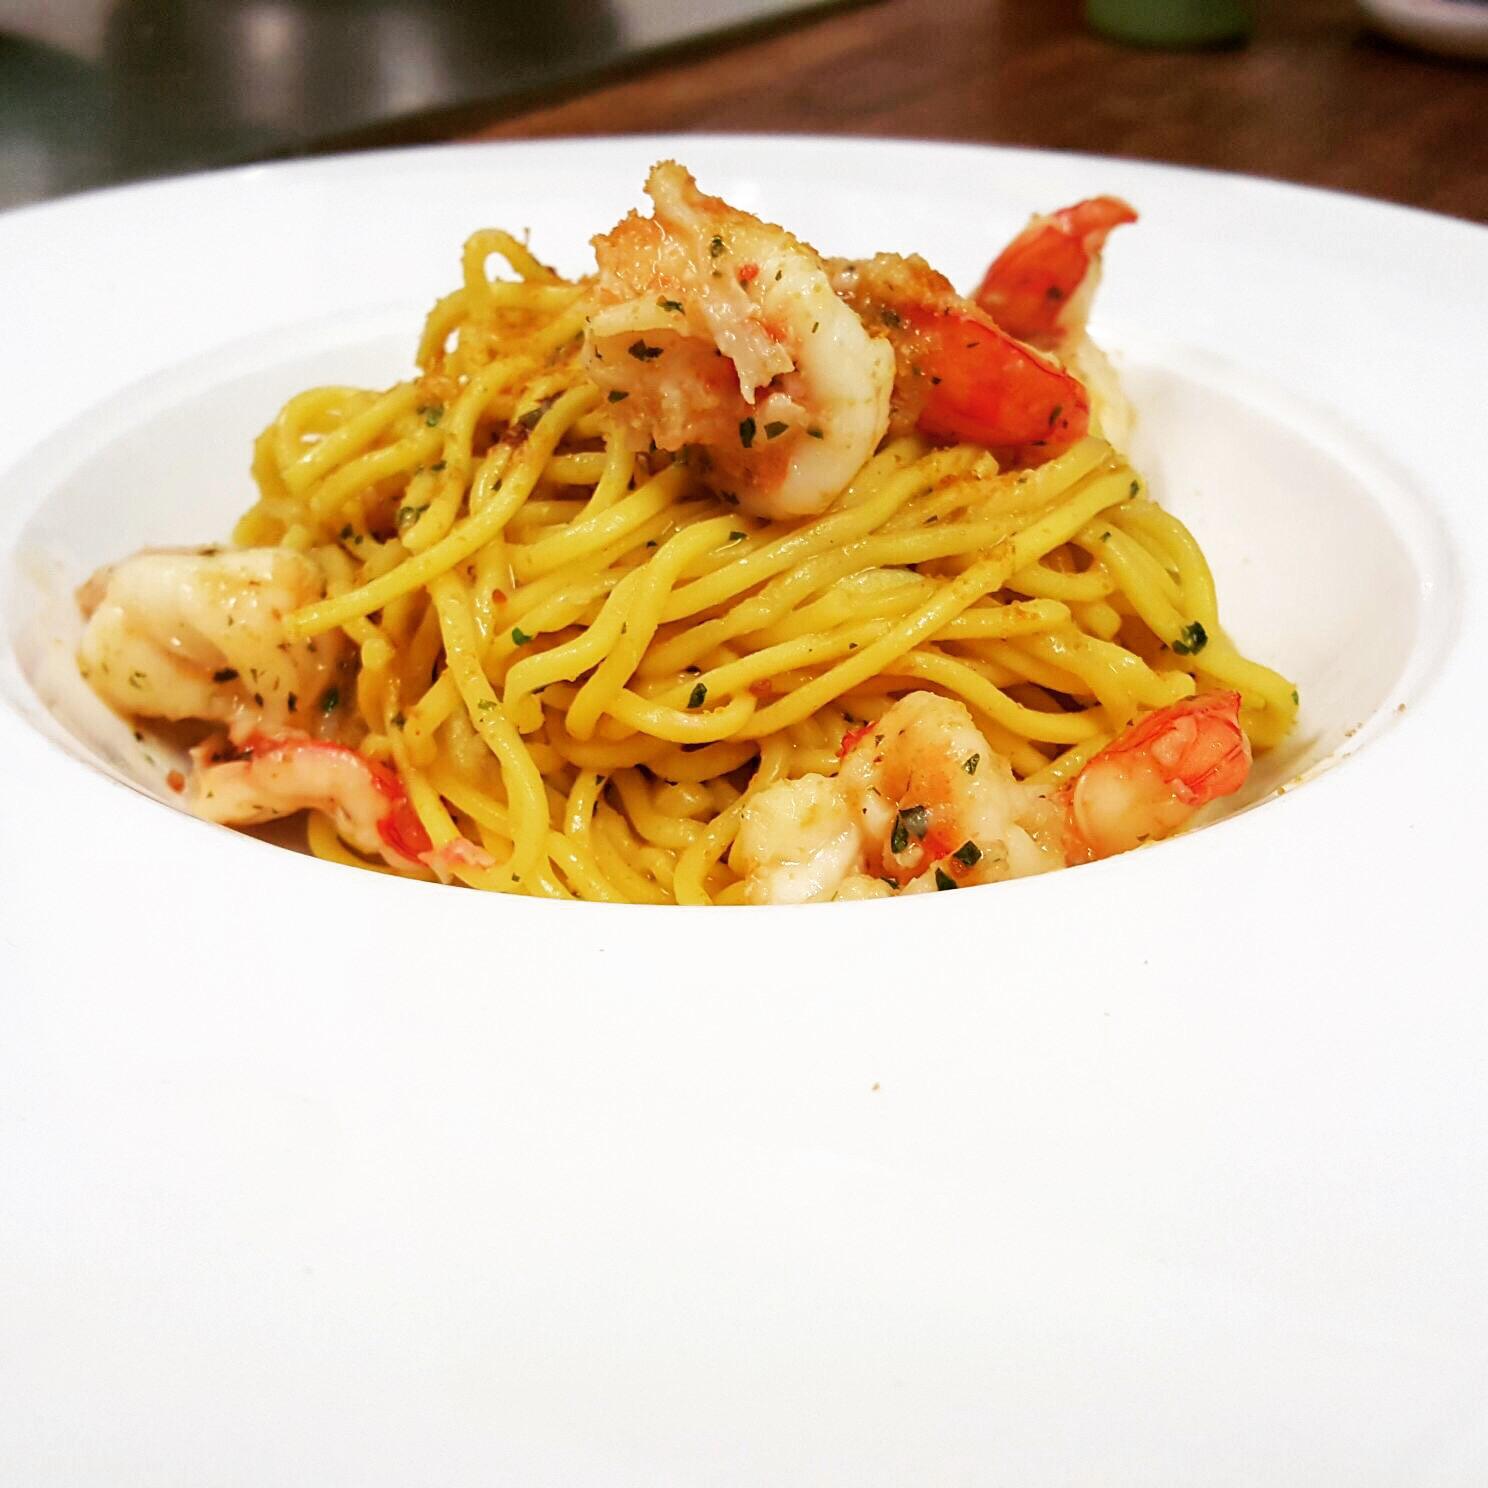 Homemade tagliolini with lemon, prawns and bottarga